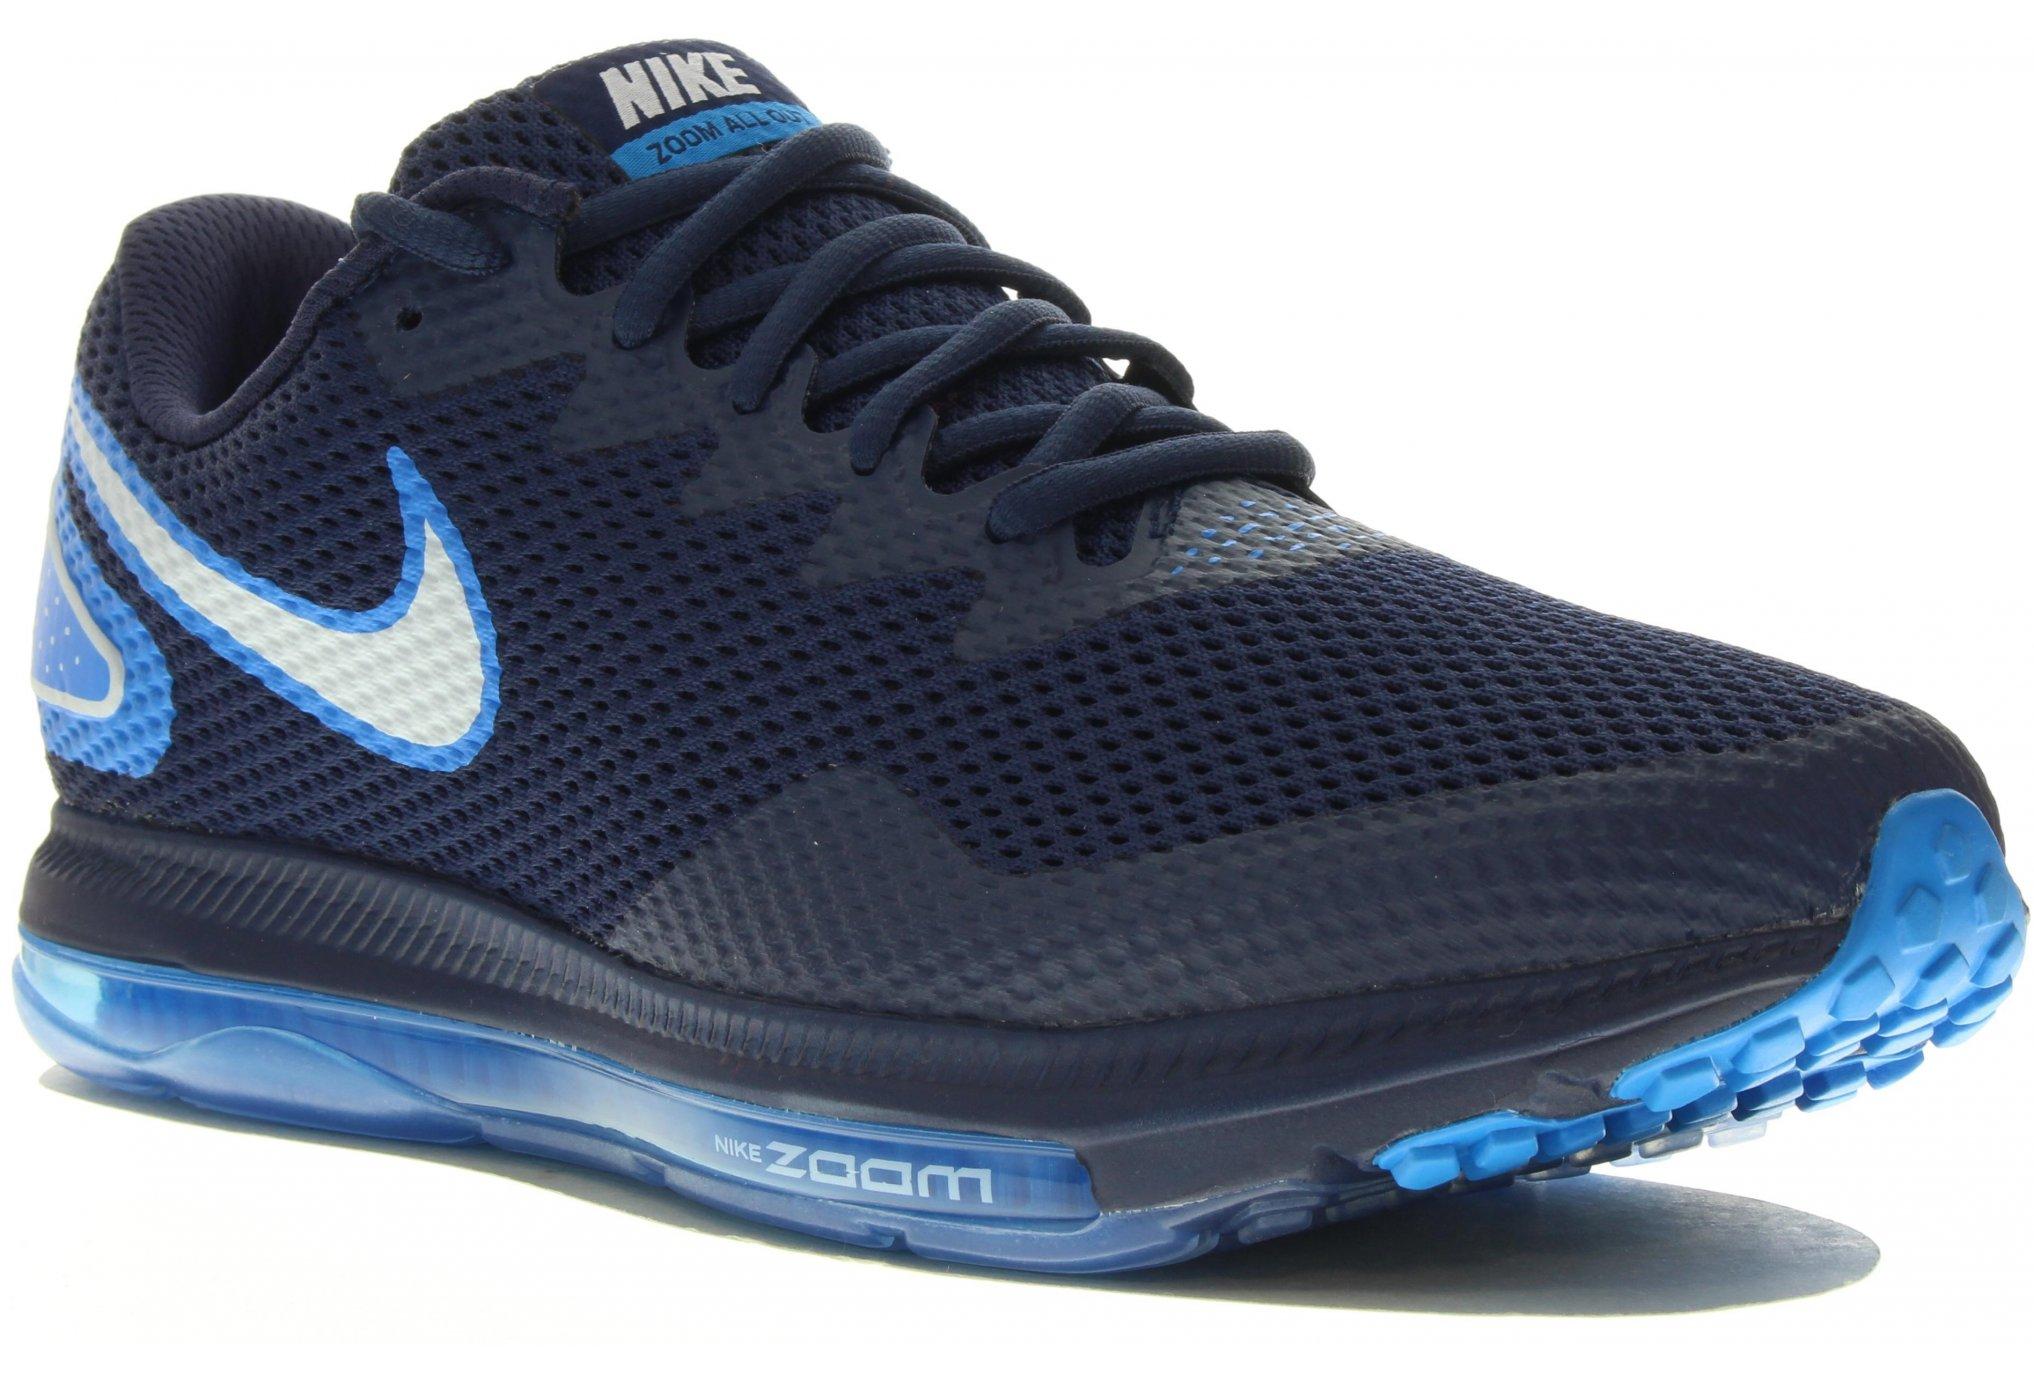 Nike Zoom All Out Low 2 M Diététique Chaussures homme